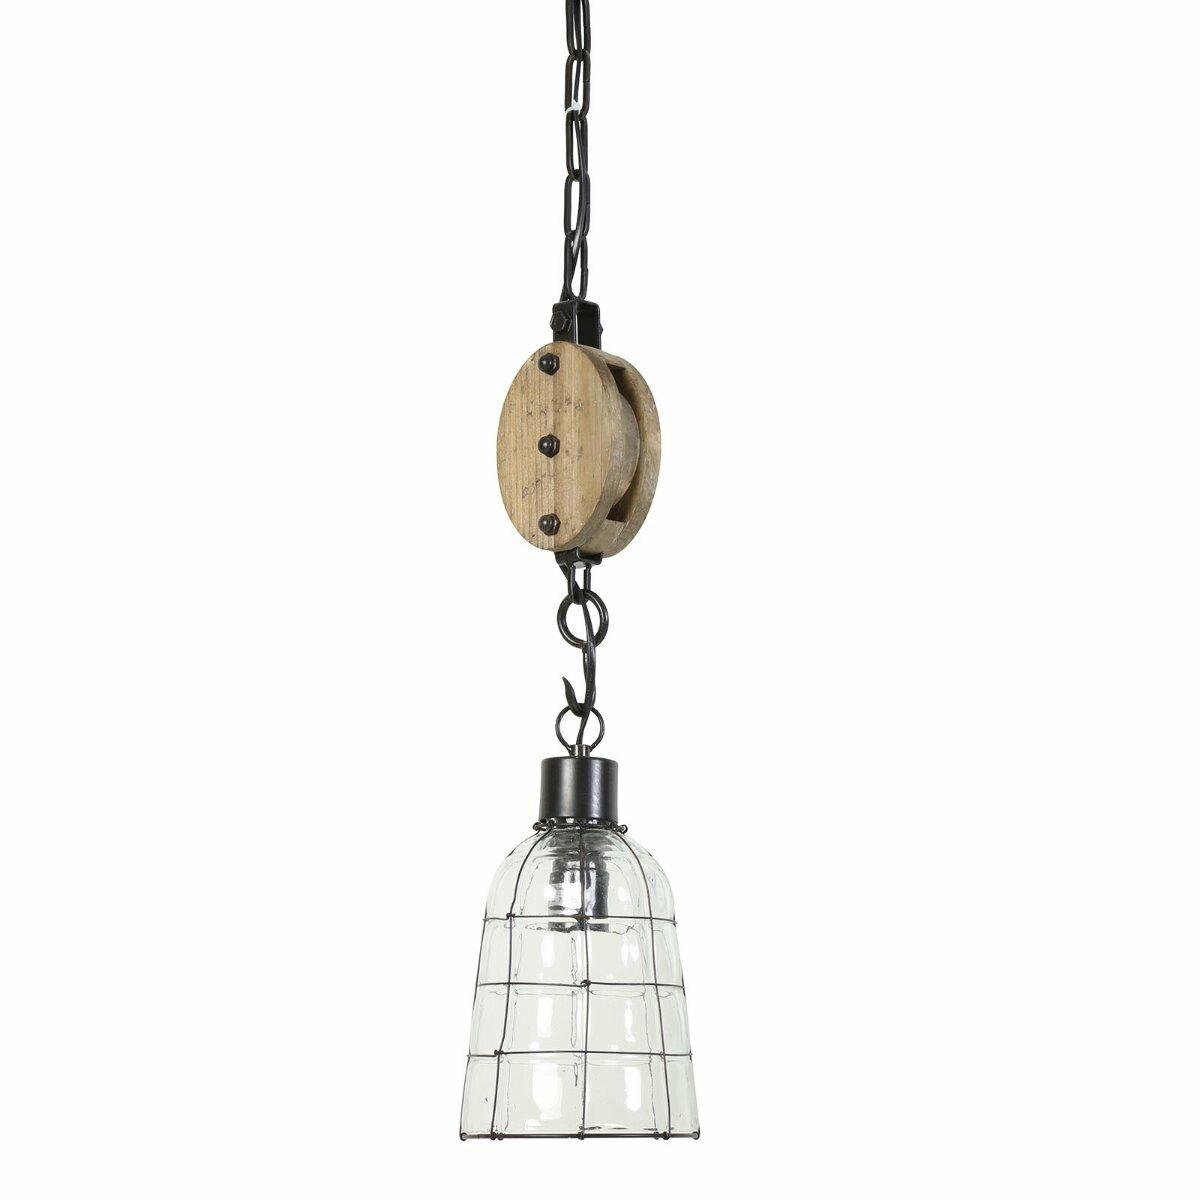 Hanglamp Jente dia: 15cm glas metaal met katrol Light & Living